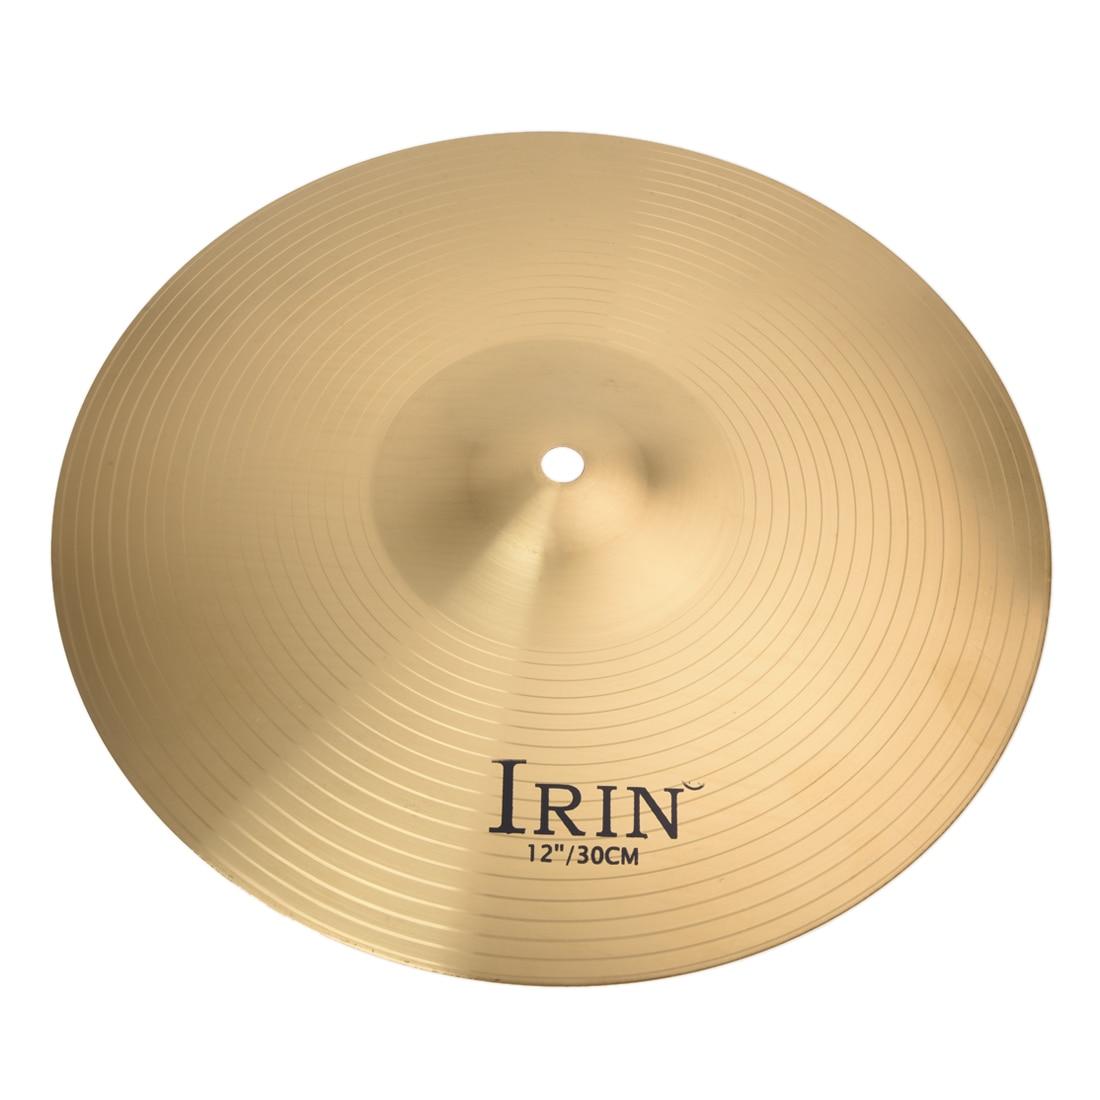 SALES 5xIRIN High Quality 12 Brass Crash Ride Hi-Hat Cymbals Box Drum Set Professional тарелка хай хэт zultan 13 hi hat cs series